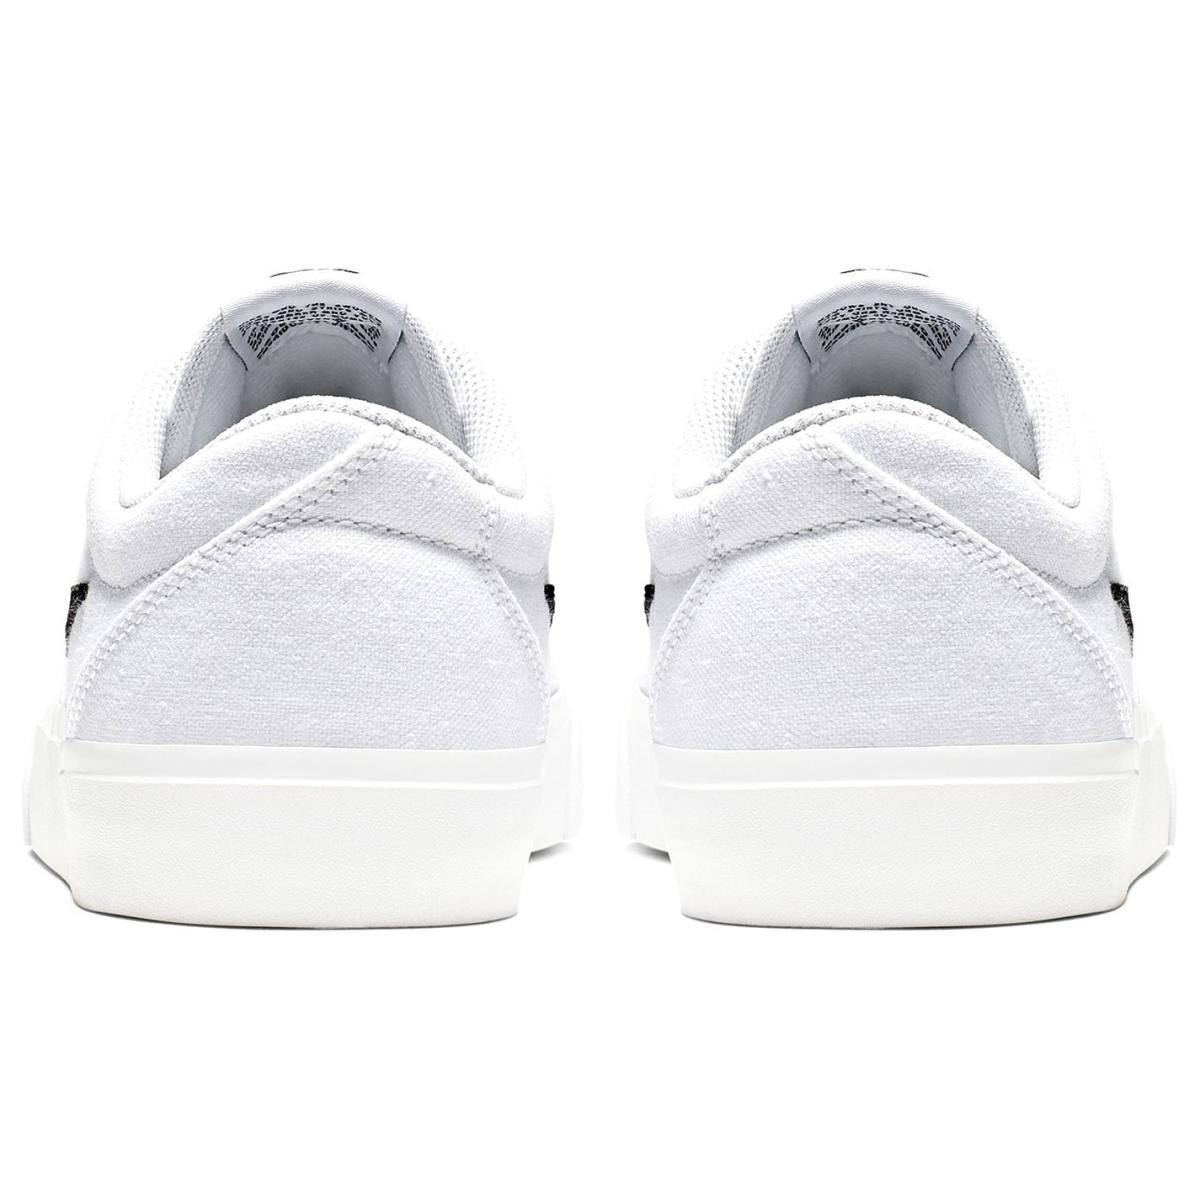 Nike-SB-Lot-Solarsoft-Skate-Chaussures-Messieurs-Skater-Chaussures-De-Sport-Skate-2162 miniature 68